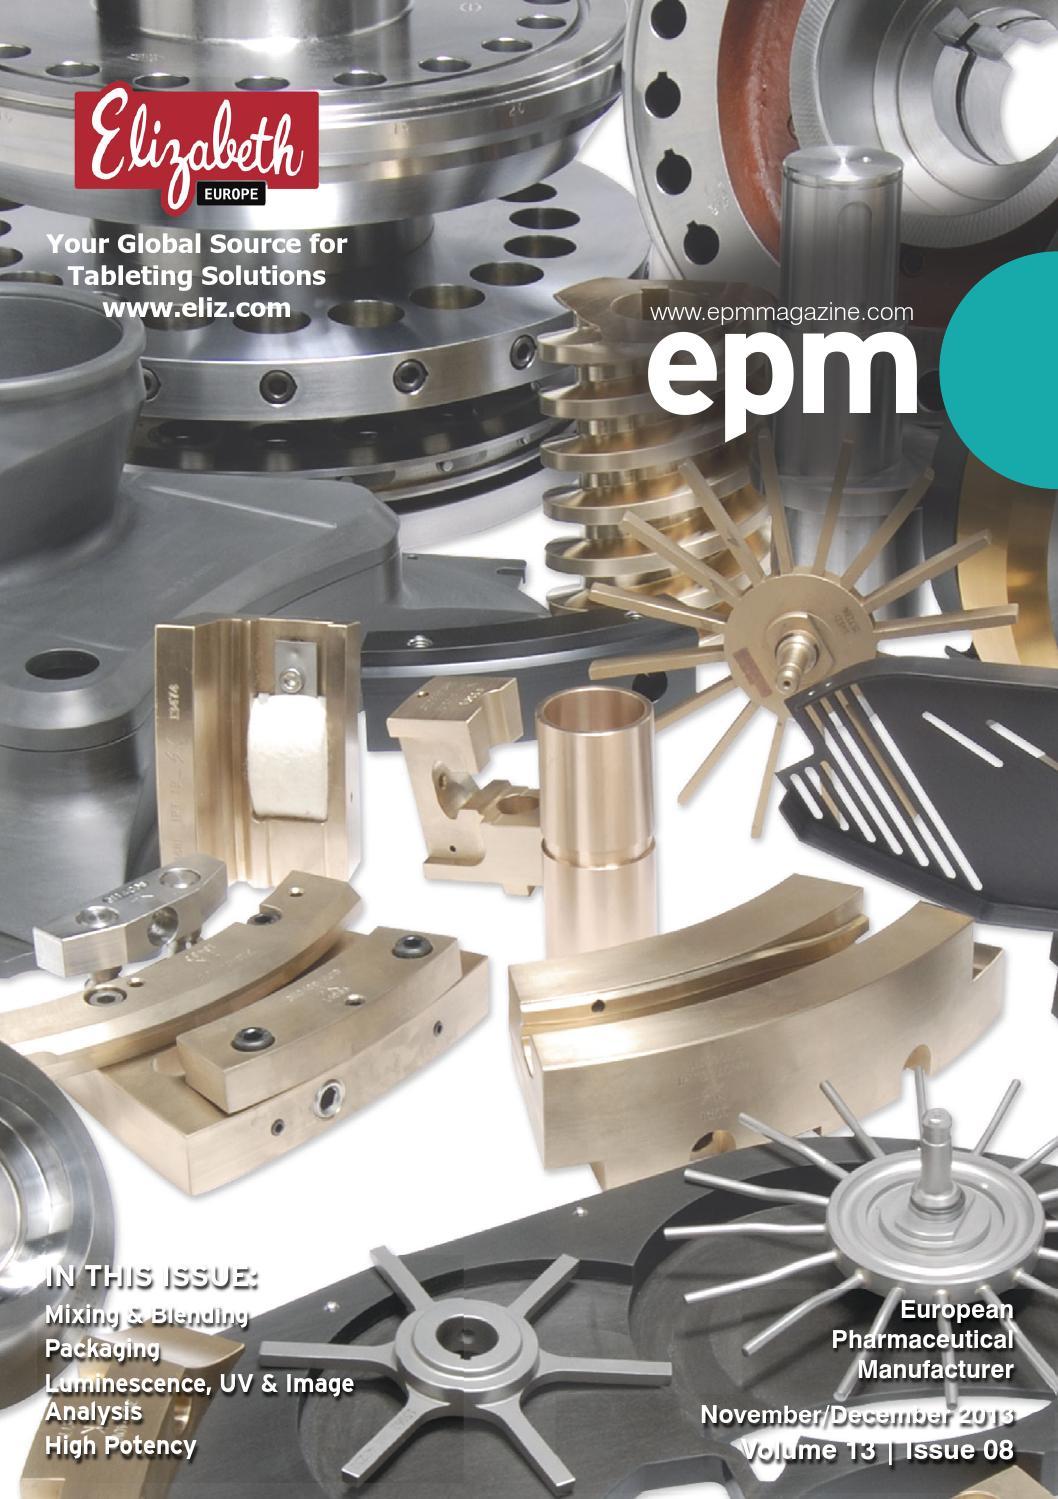 EPM Nov/Dec 2013 by EPM Magazine - issuu